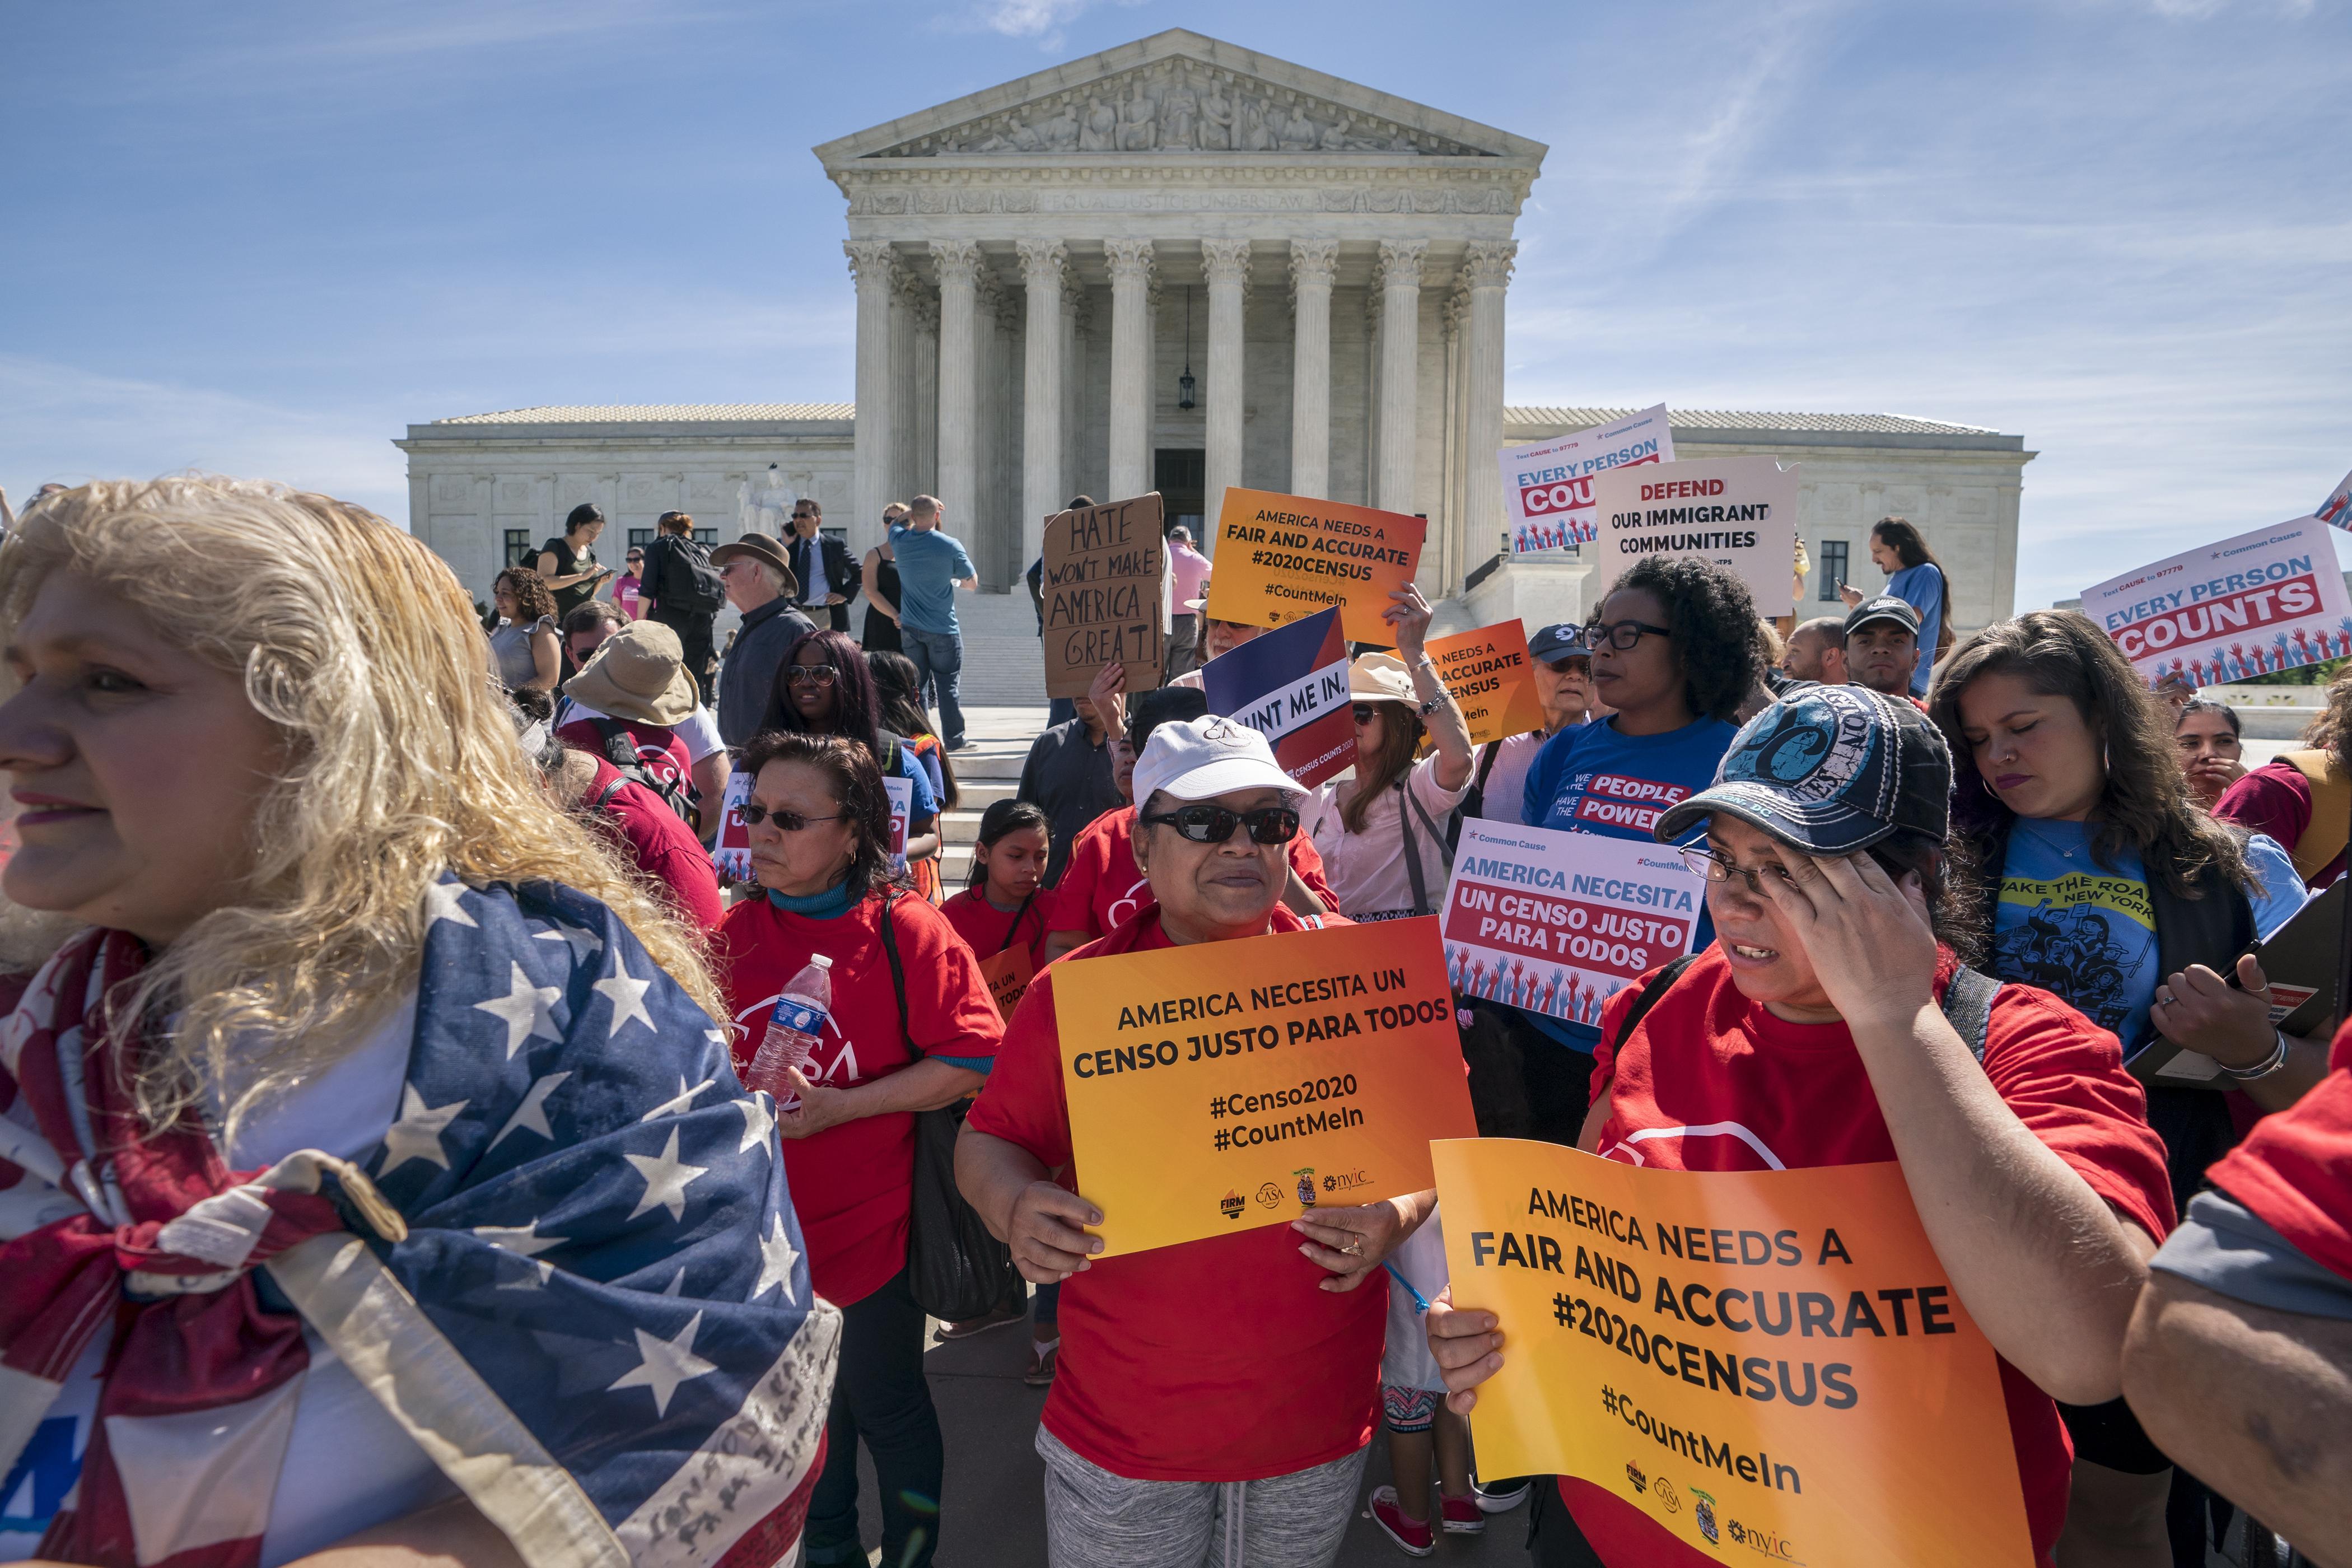 DOJ to resist House subpoena on census citizenship controversy